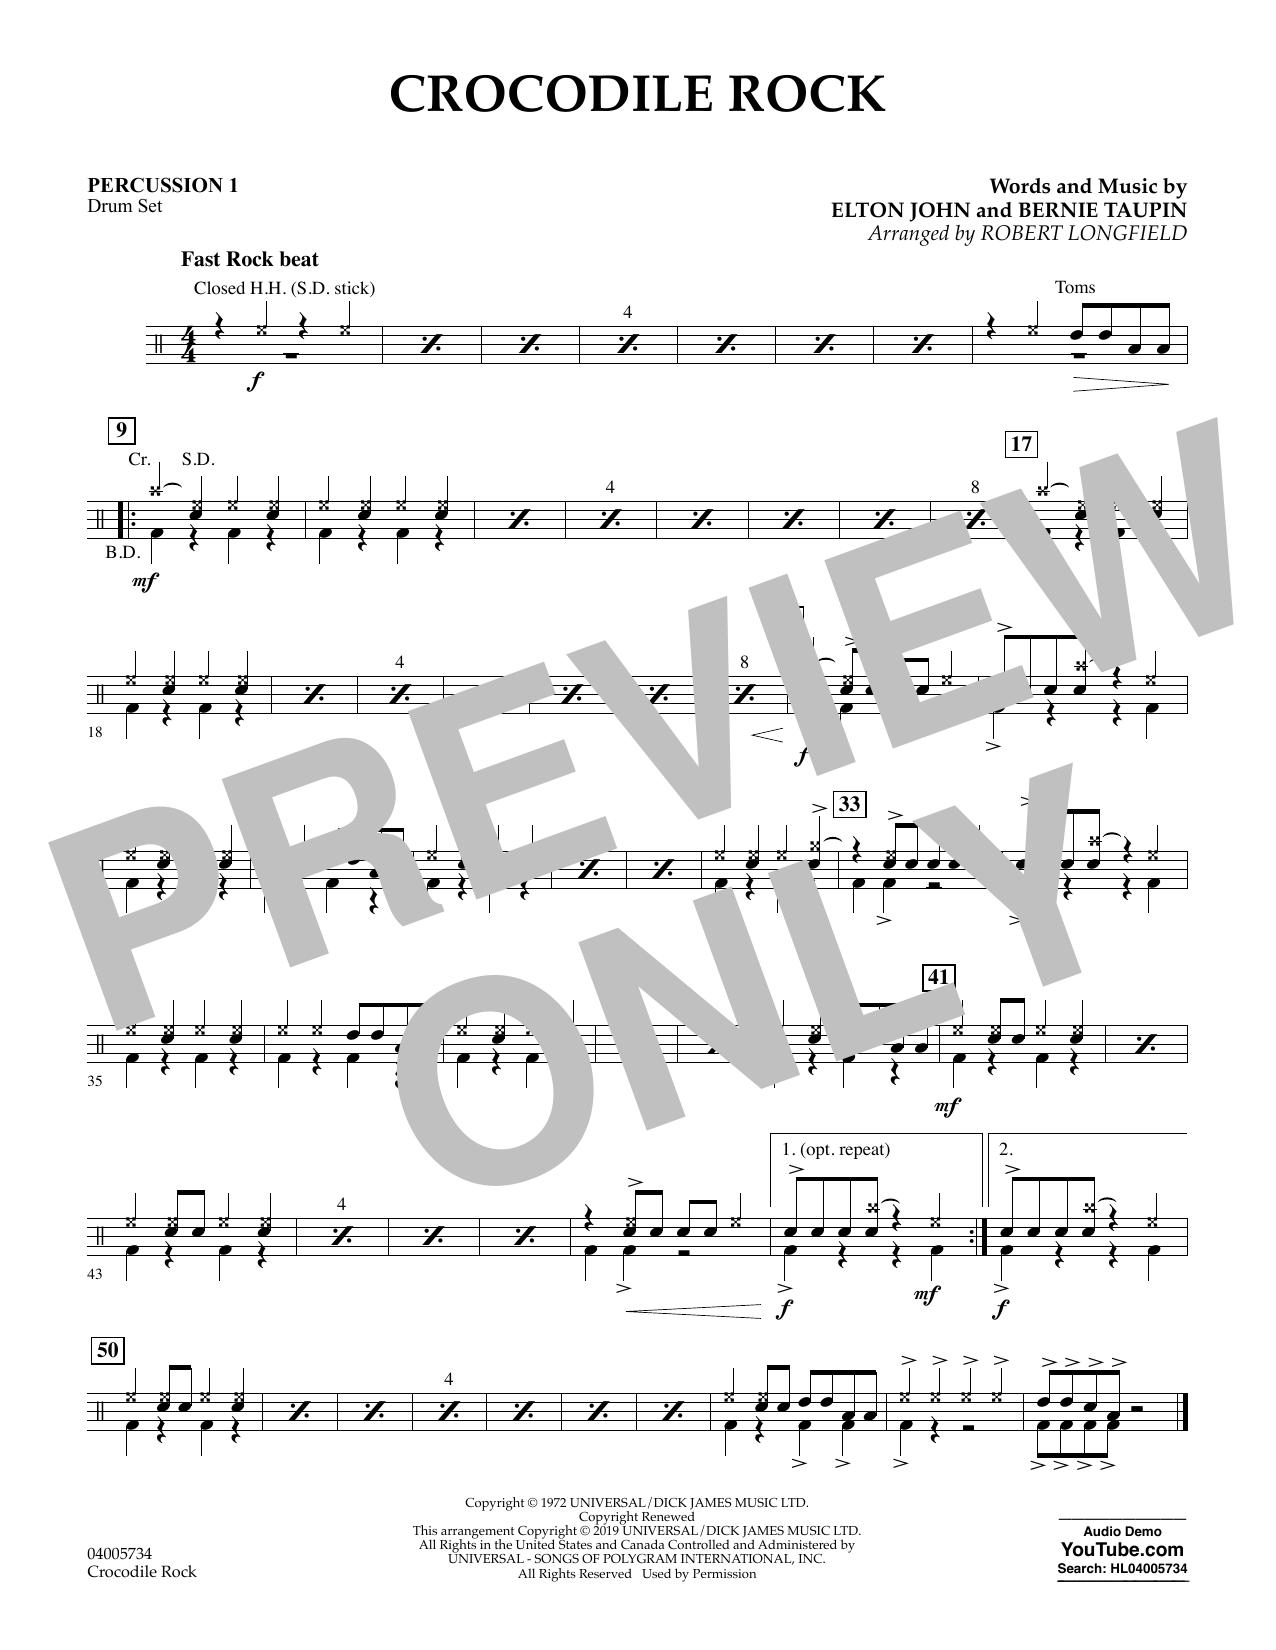 Crocodile Rock (arr. Robert Longfield) - Percussion 1 (Concert Band)